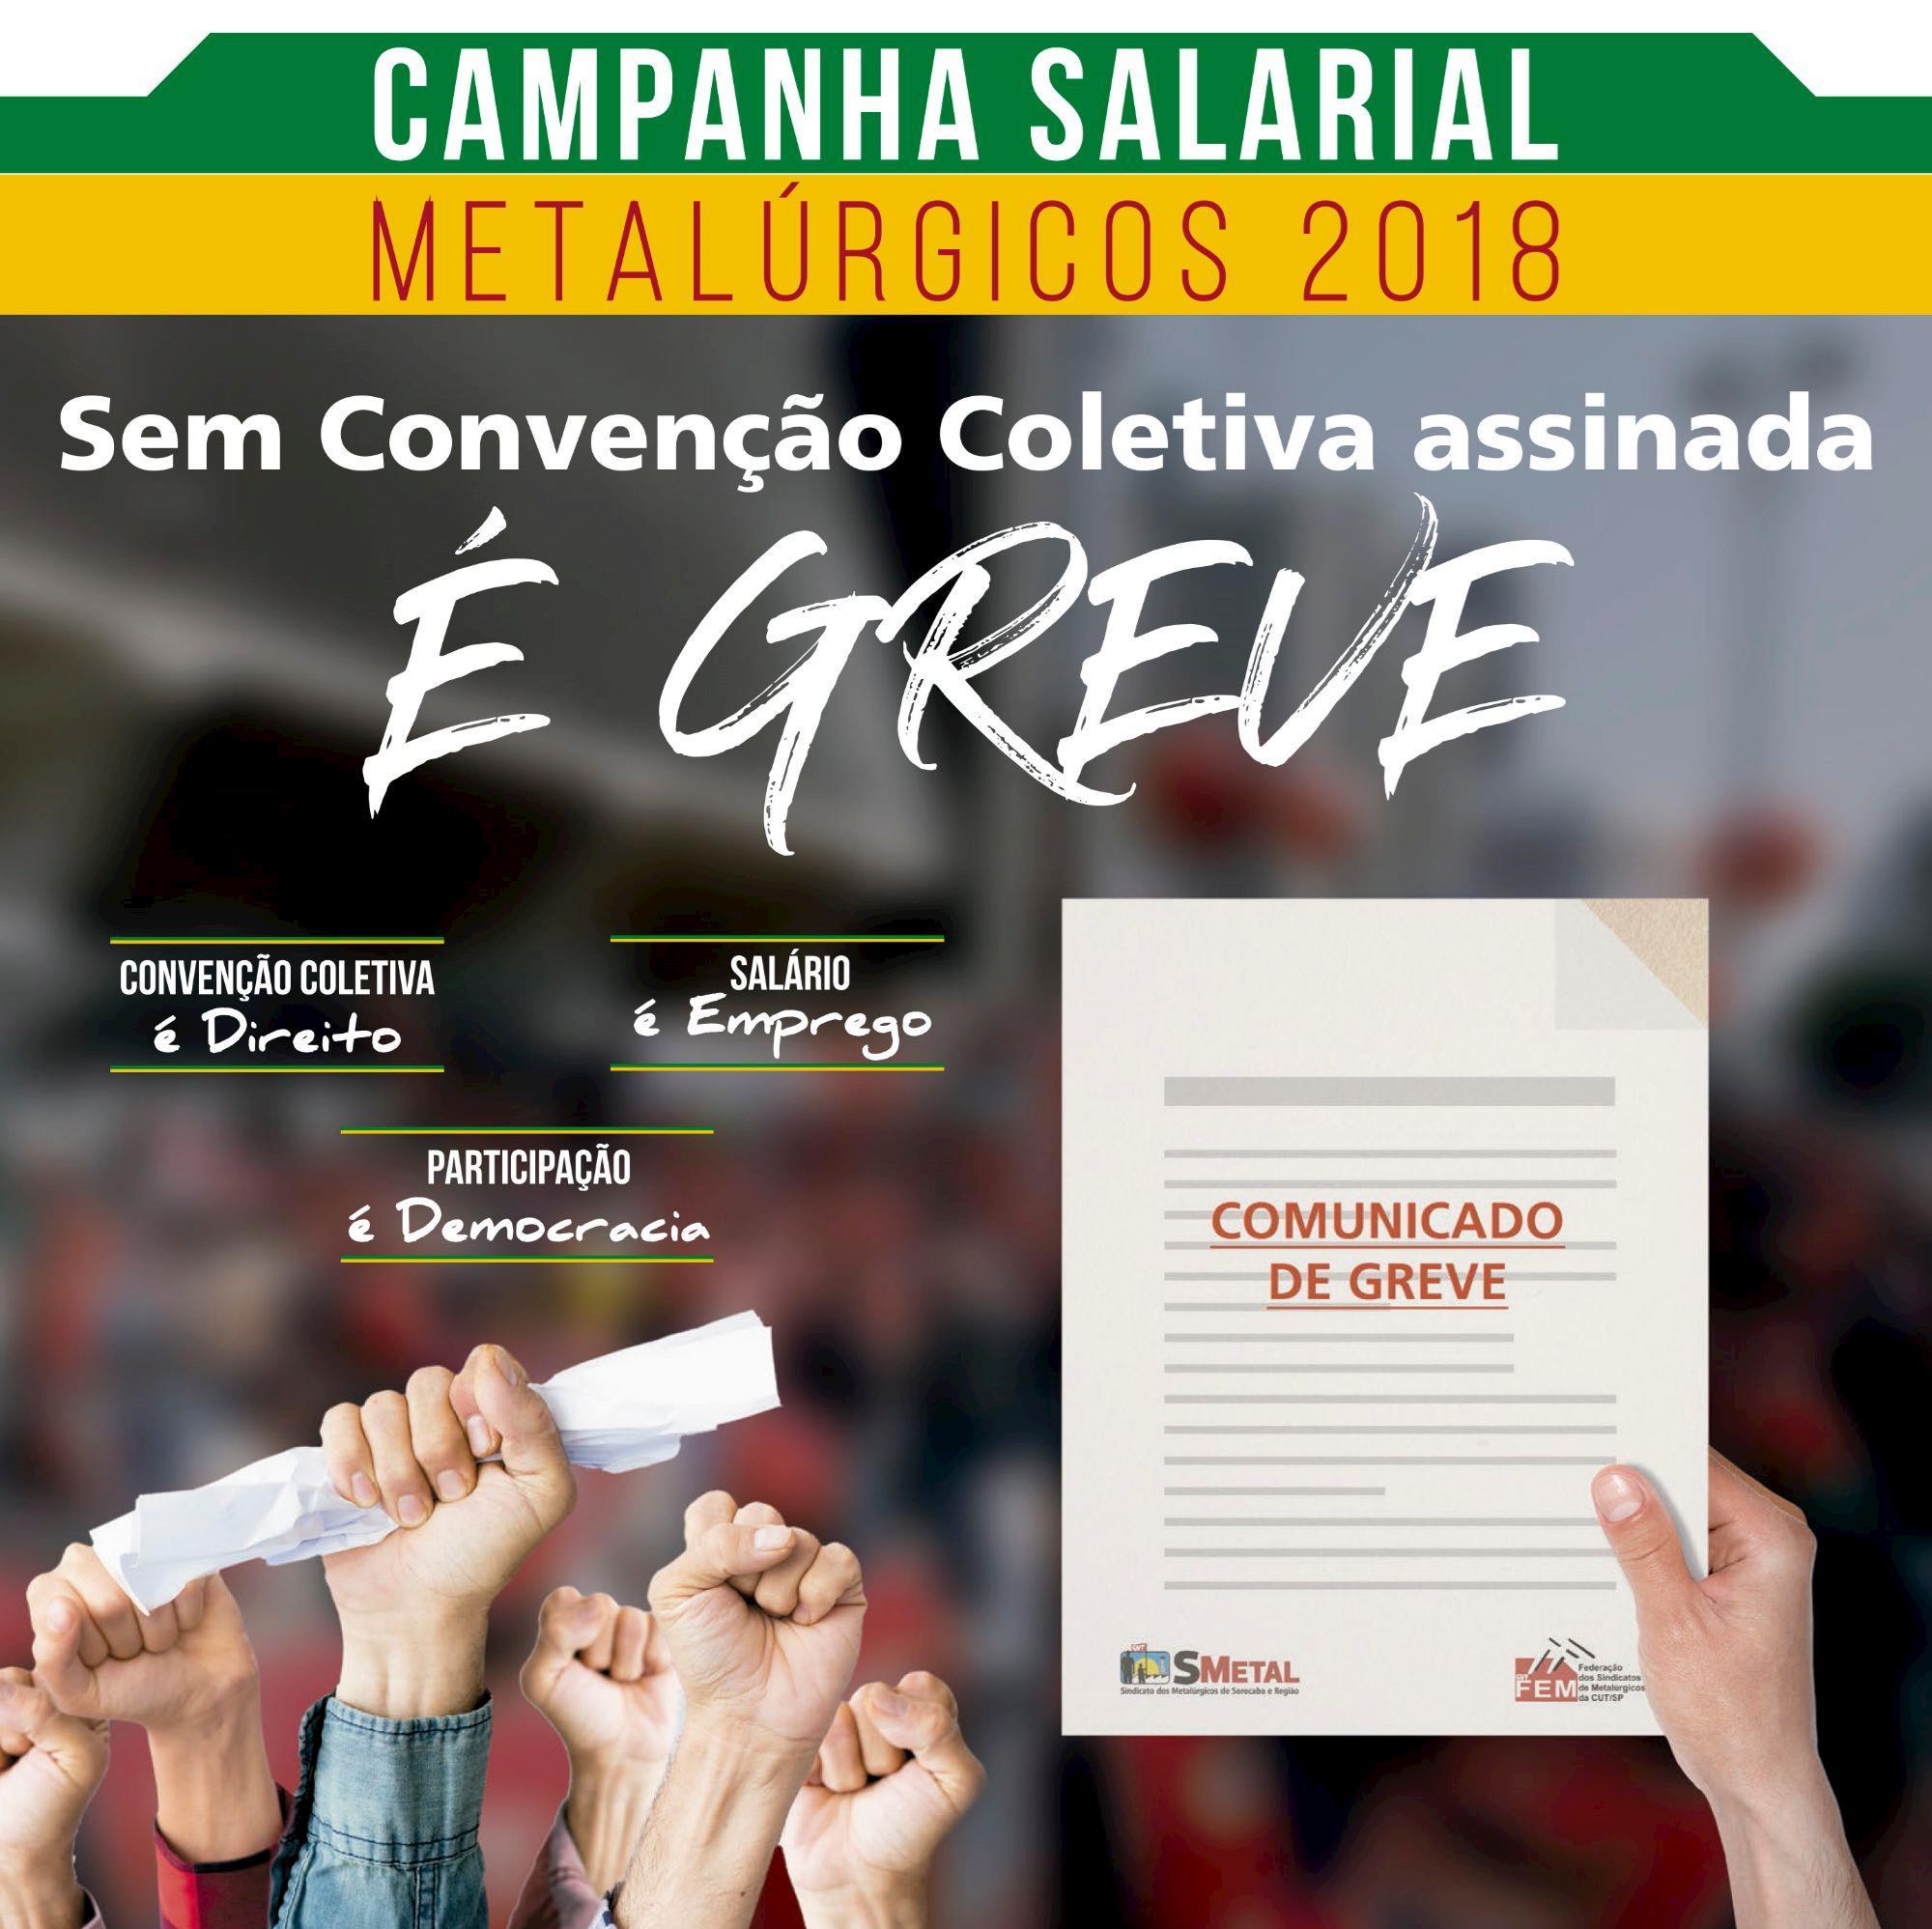 greve, campanha, salarial, Arte: Lucas Delgado